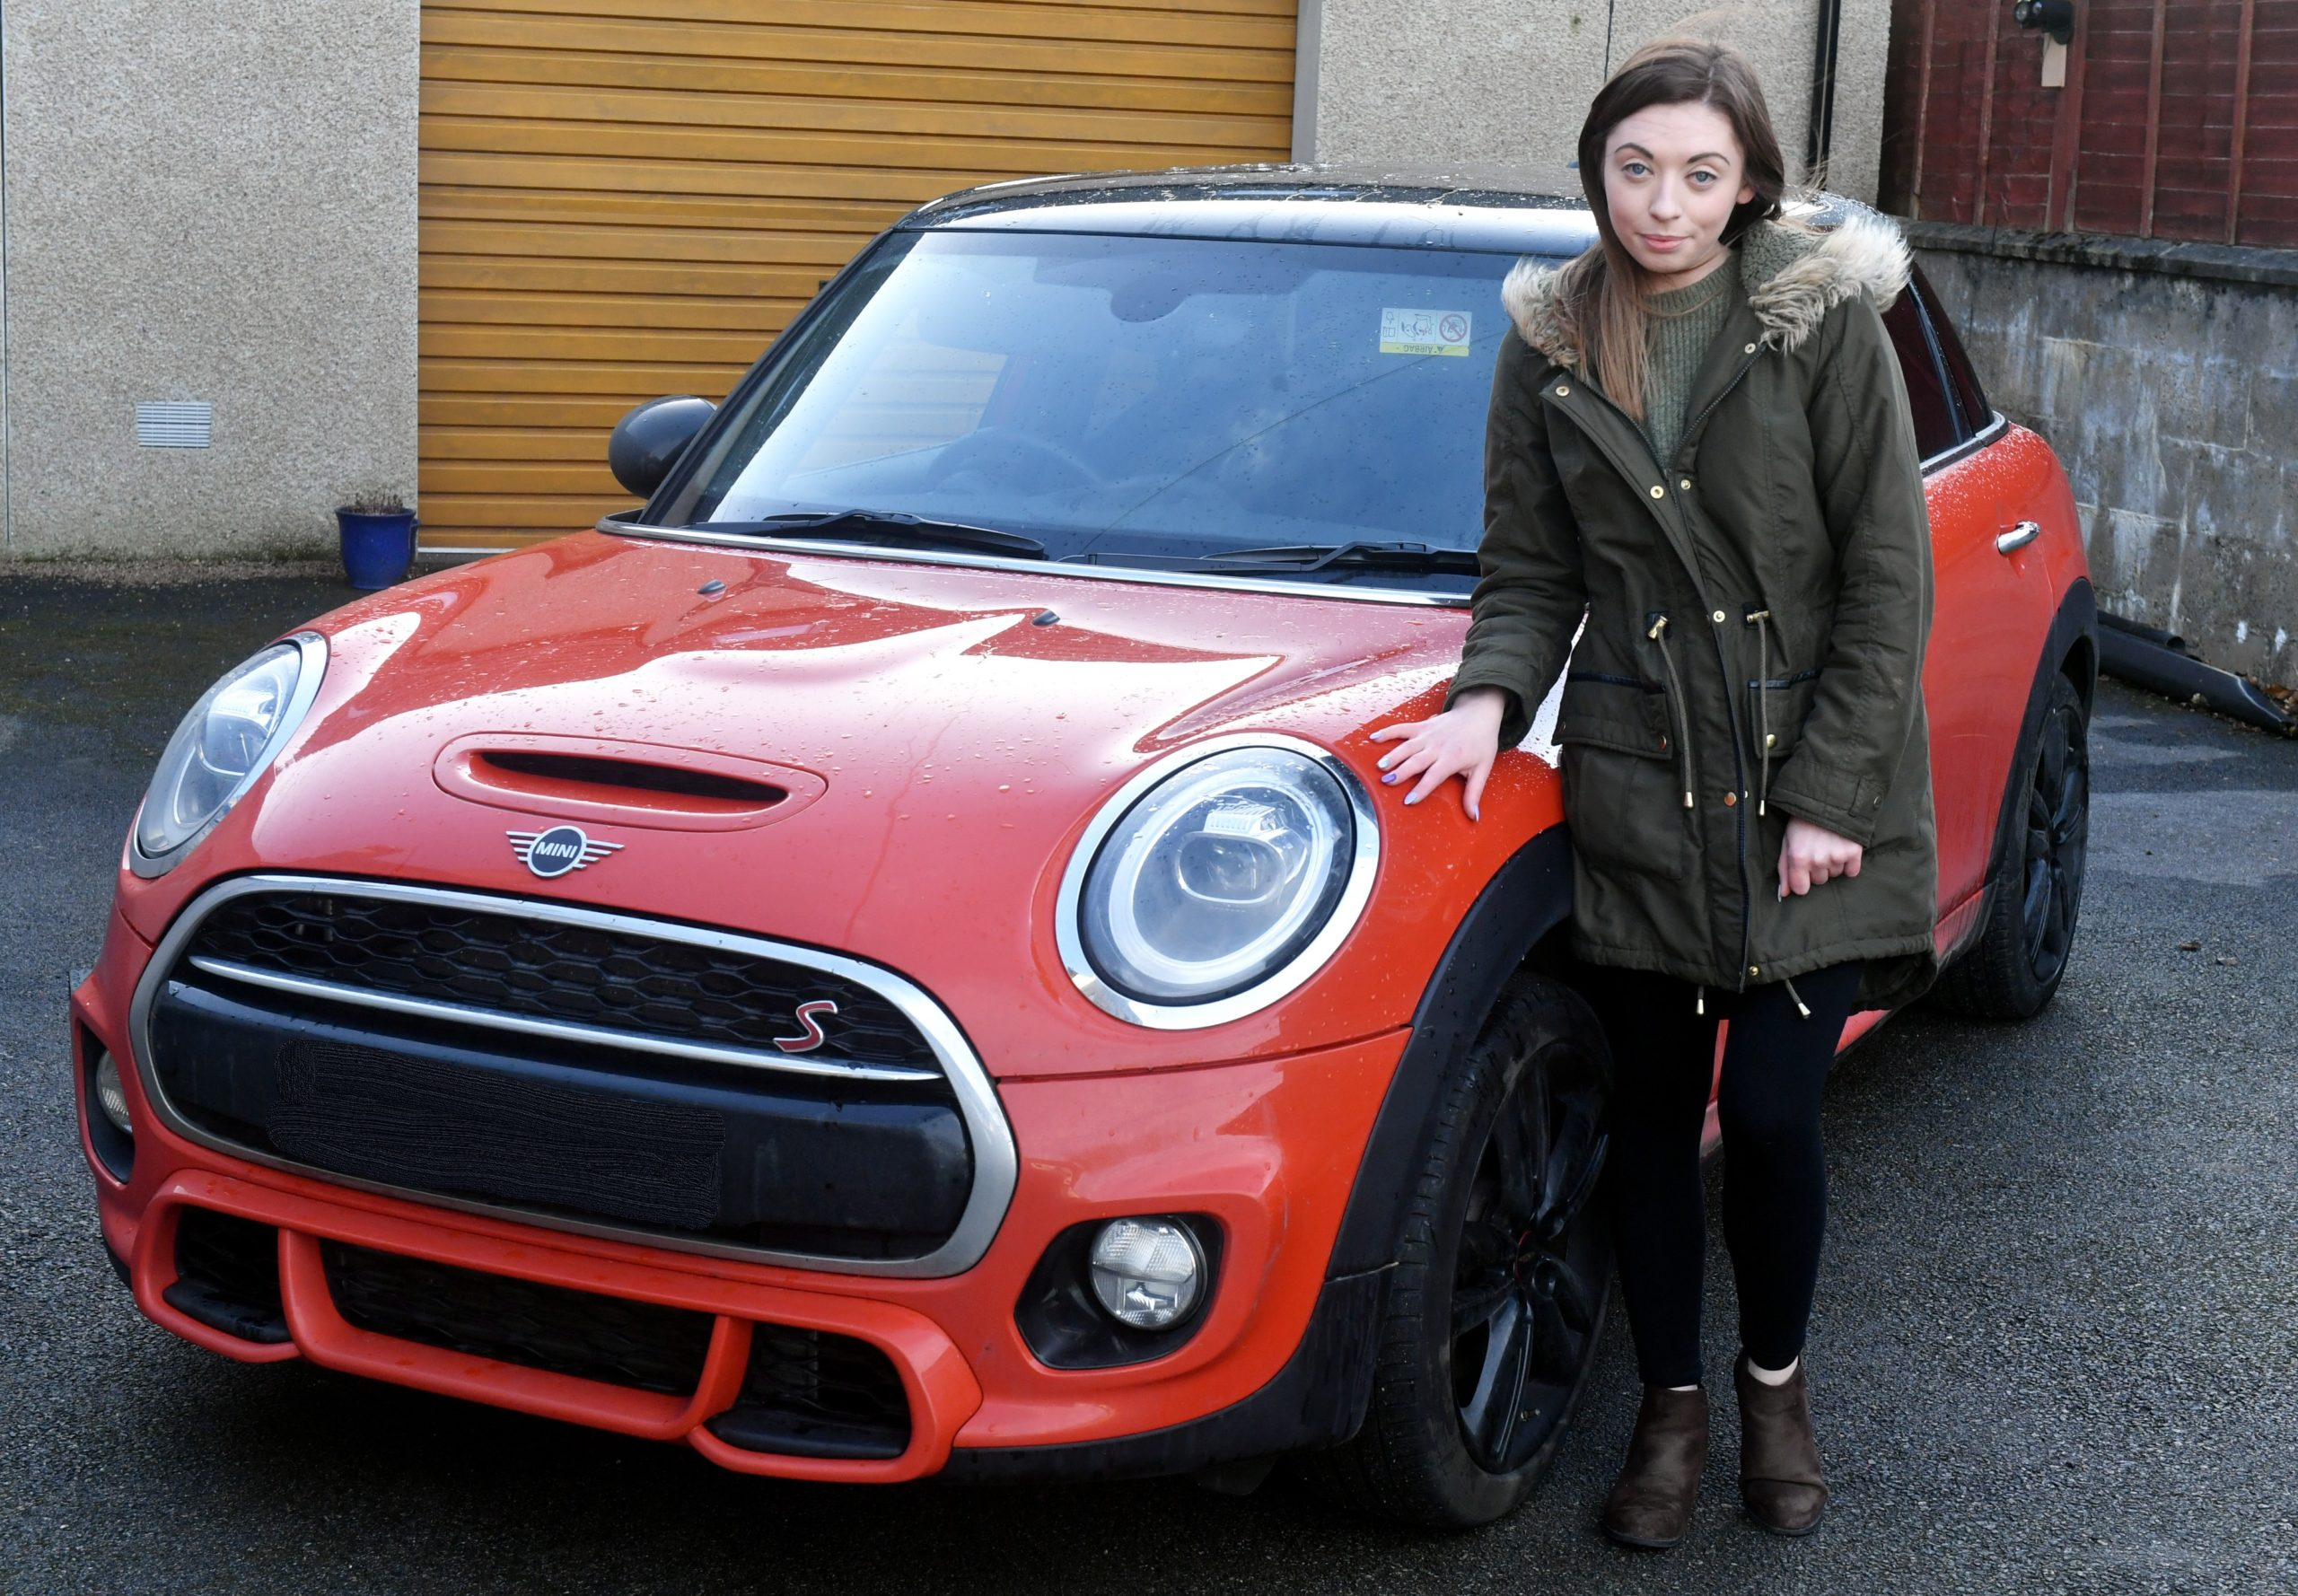 Pharmacy technician Louise Petrie with her £25,000 Mini